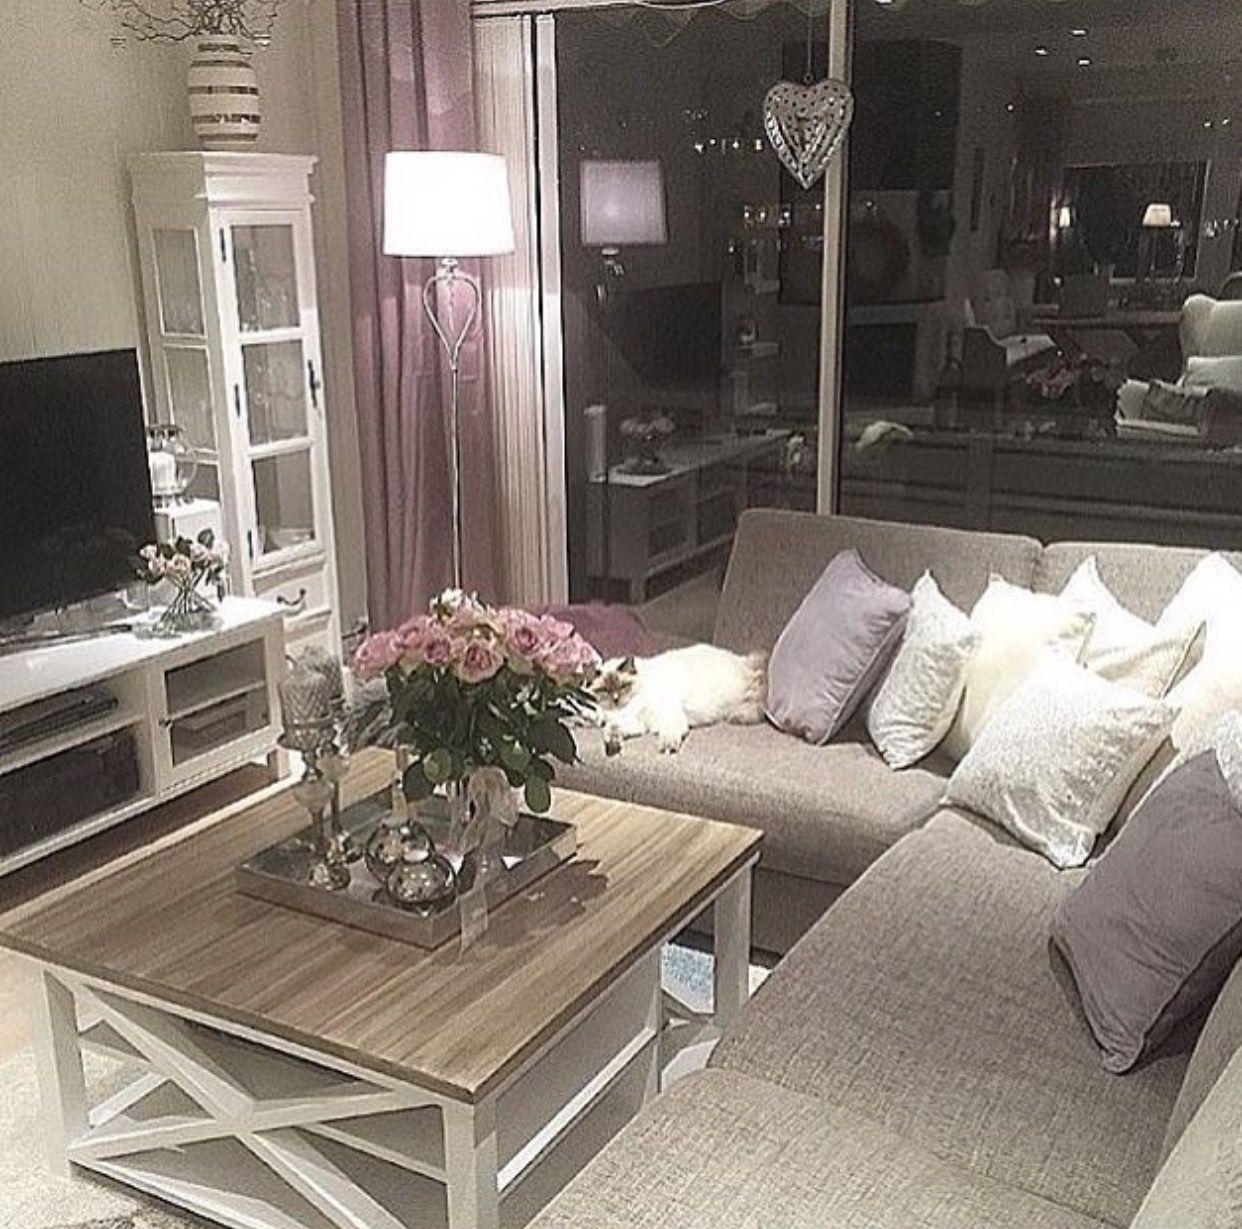 Home-entertainment-design-ideen pin by kristen morin on home ideas  pinterest  living rooms room